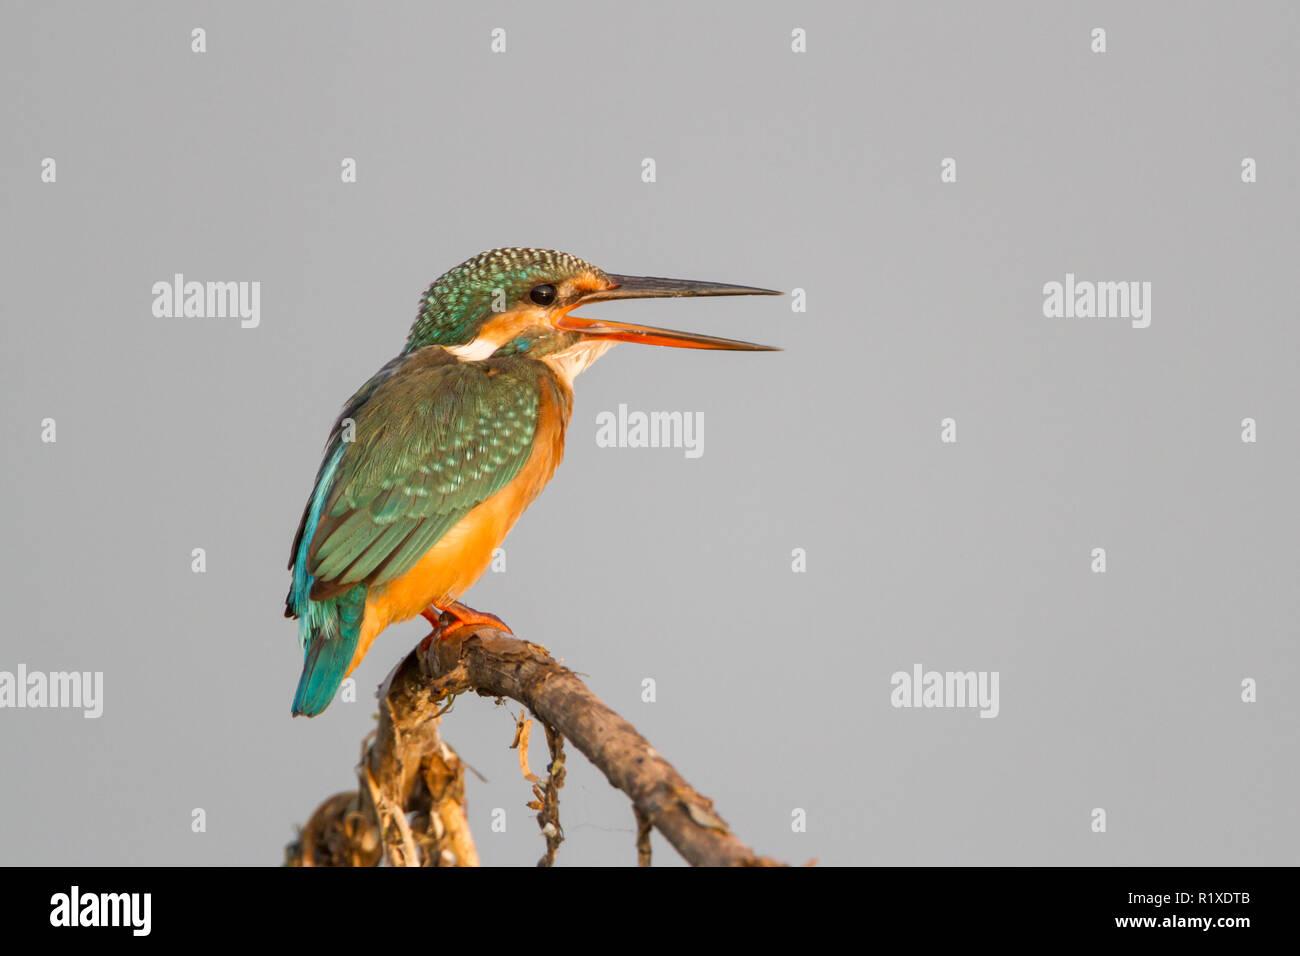 The common kingfisher (Alcedo atthis) at Pune, Maharashtra, India. - Stock Image